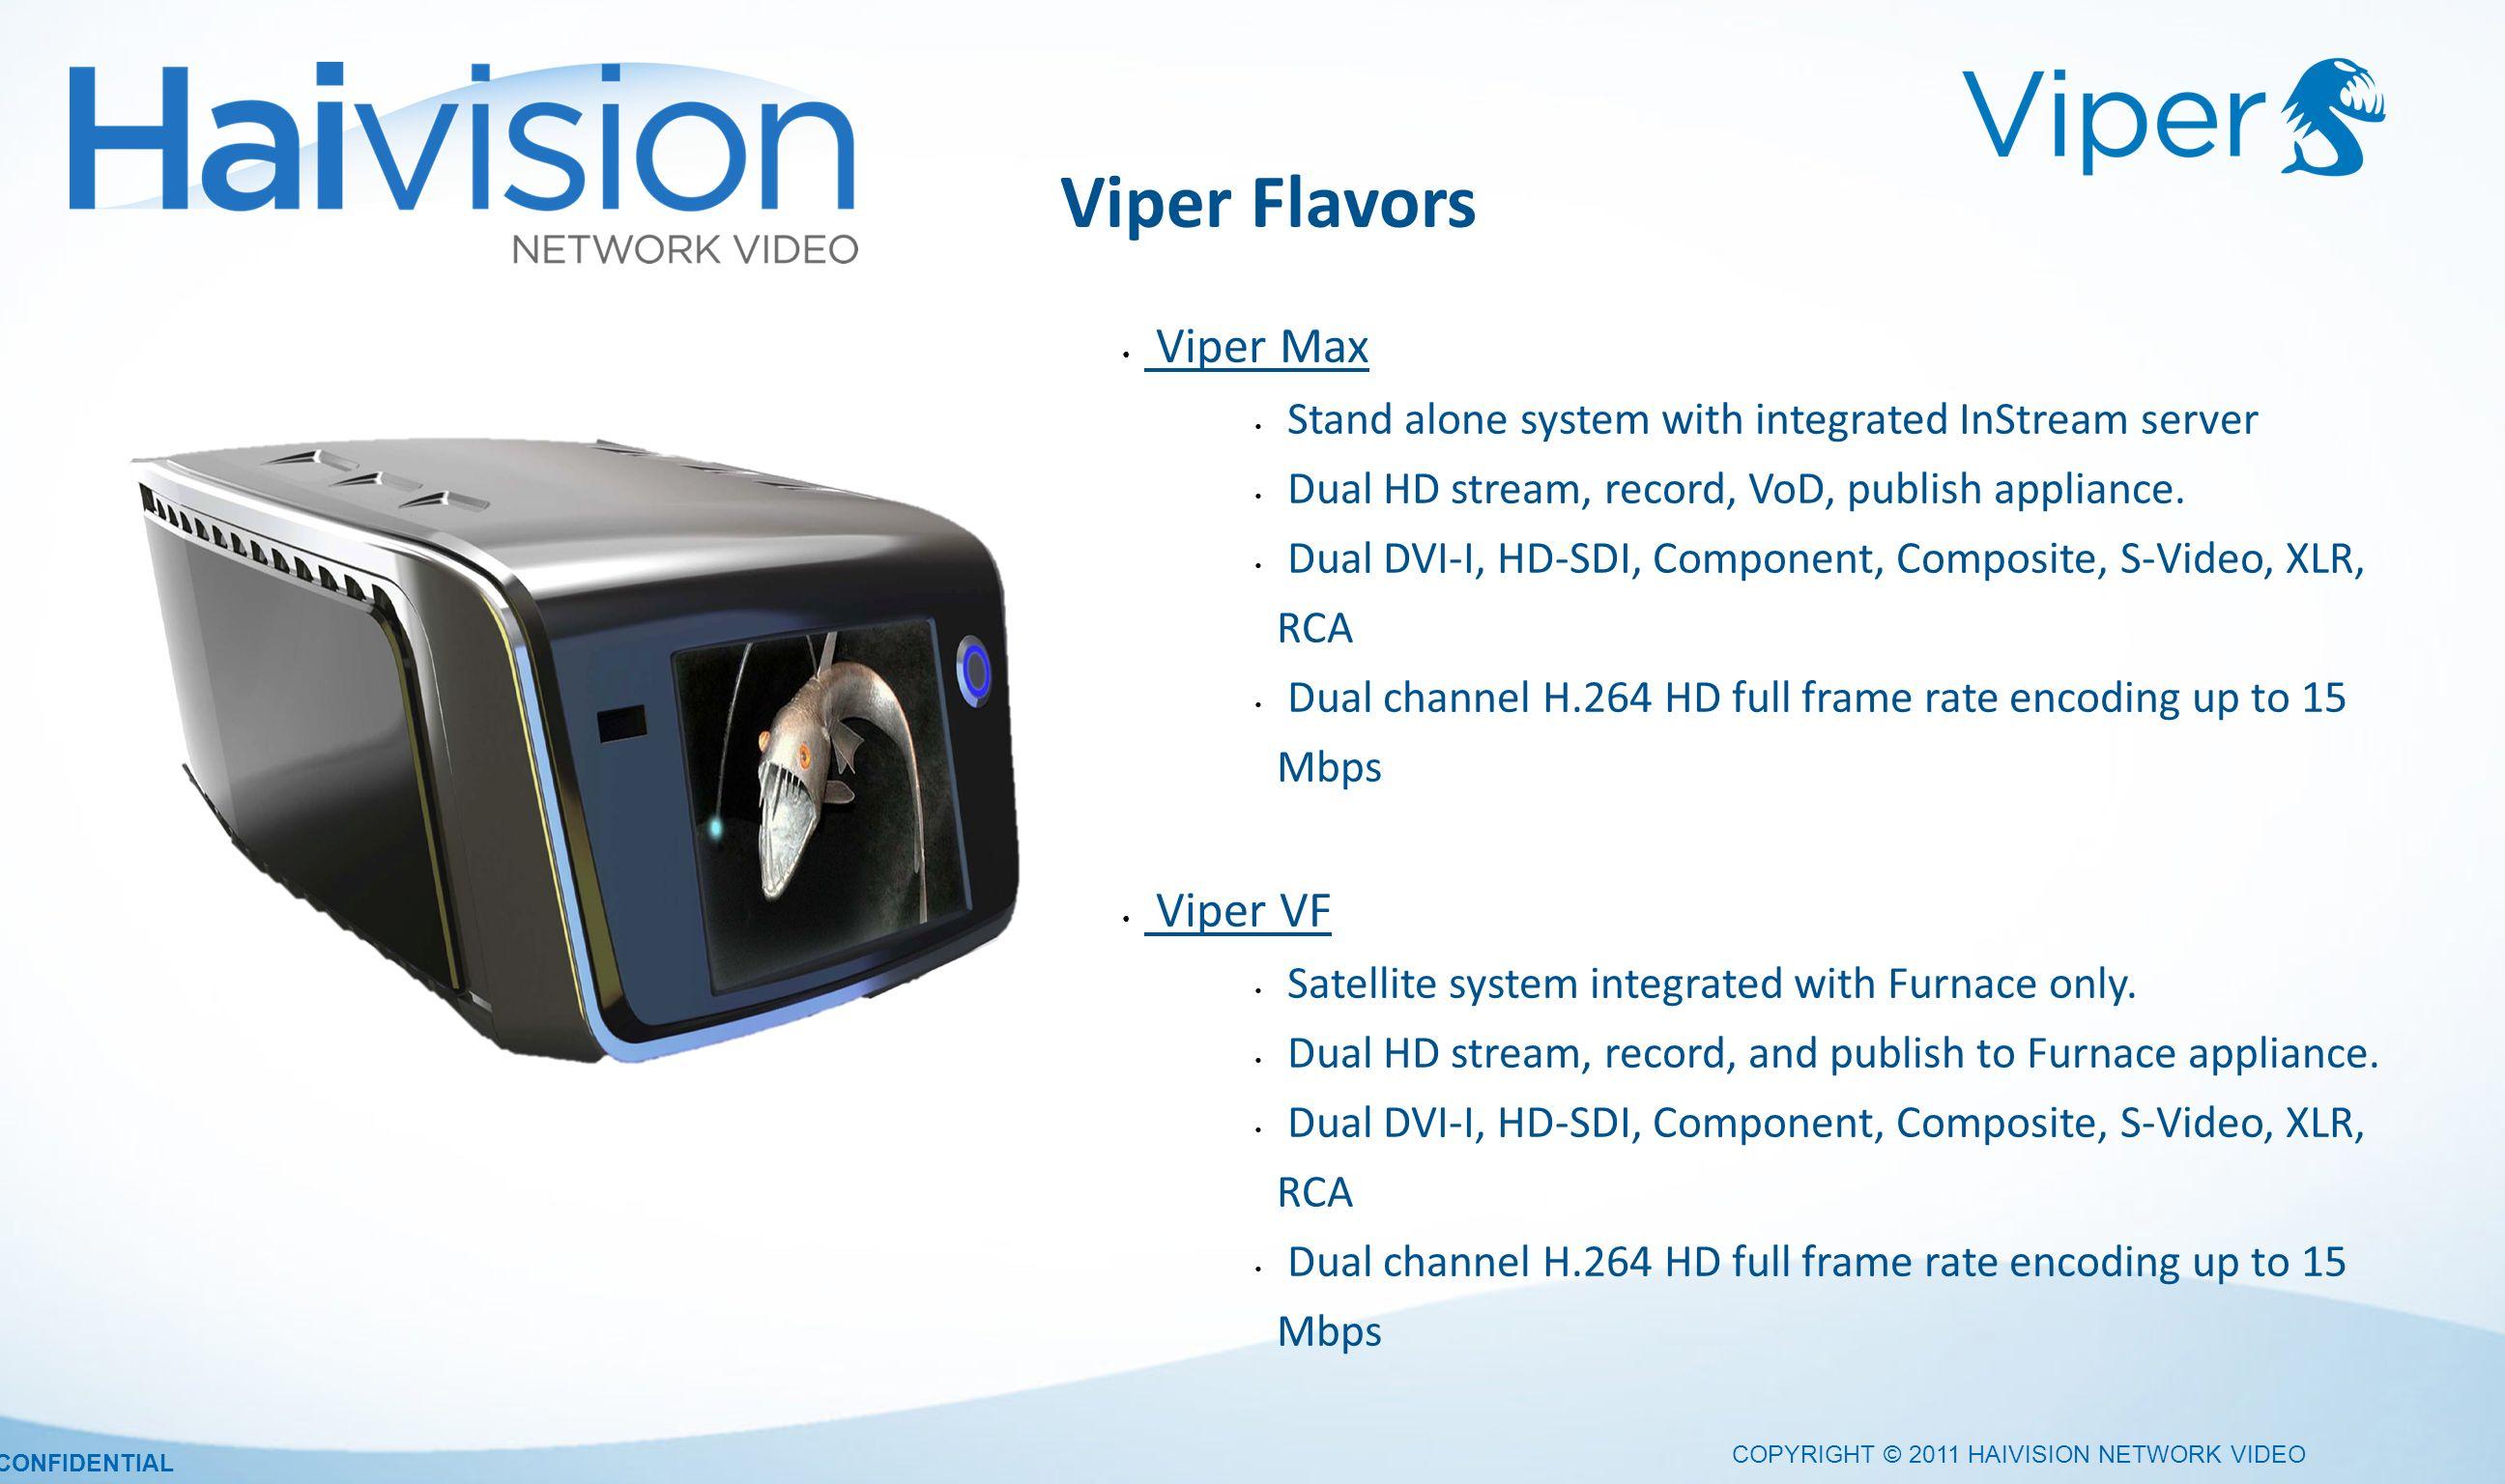 Viper Flavors Viper Max Viper VF